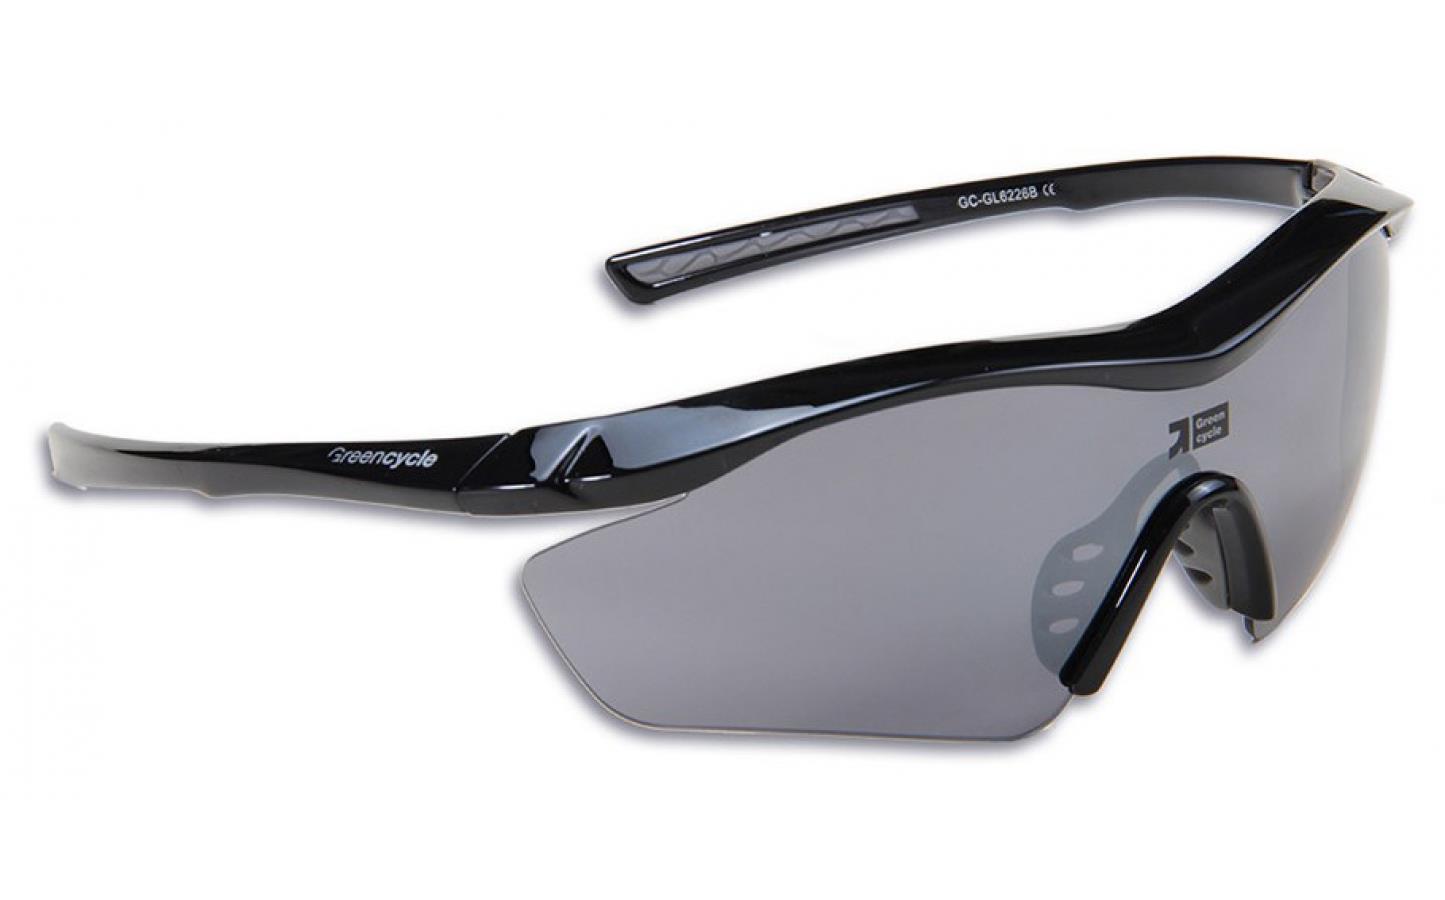 Очки Green Cycle GC-GL6226 купить в интернет-магазине Манарага fa7fb65c161